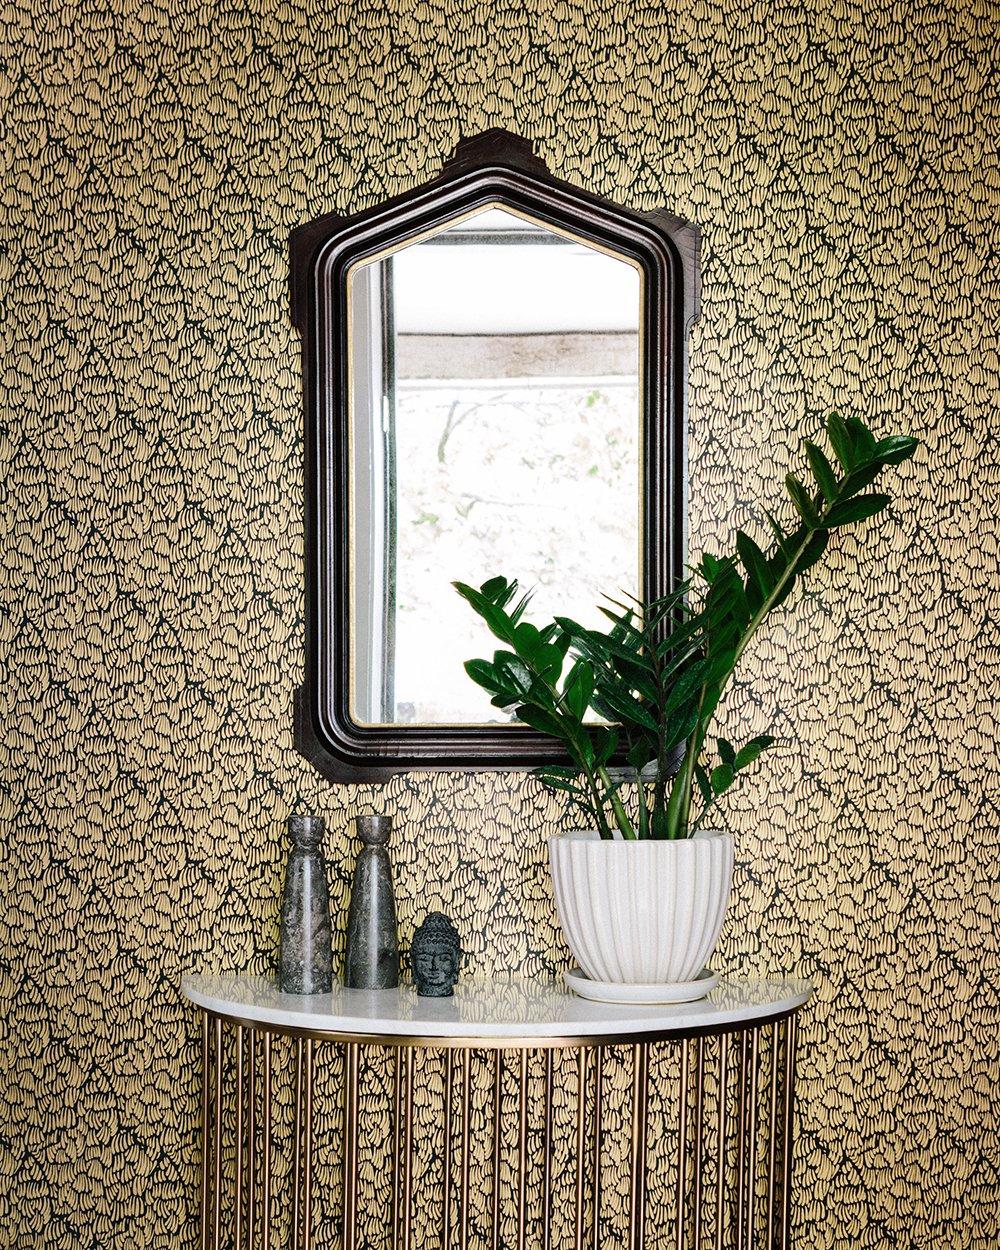 Blue Opuntia Cactus Cacti Removable Wallpaper Cactus decor